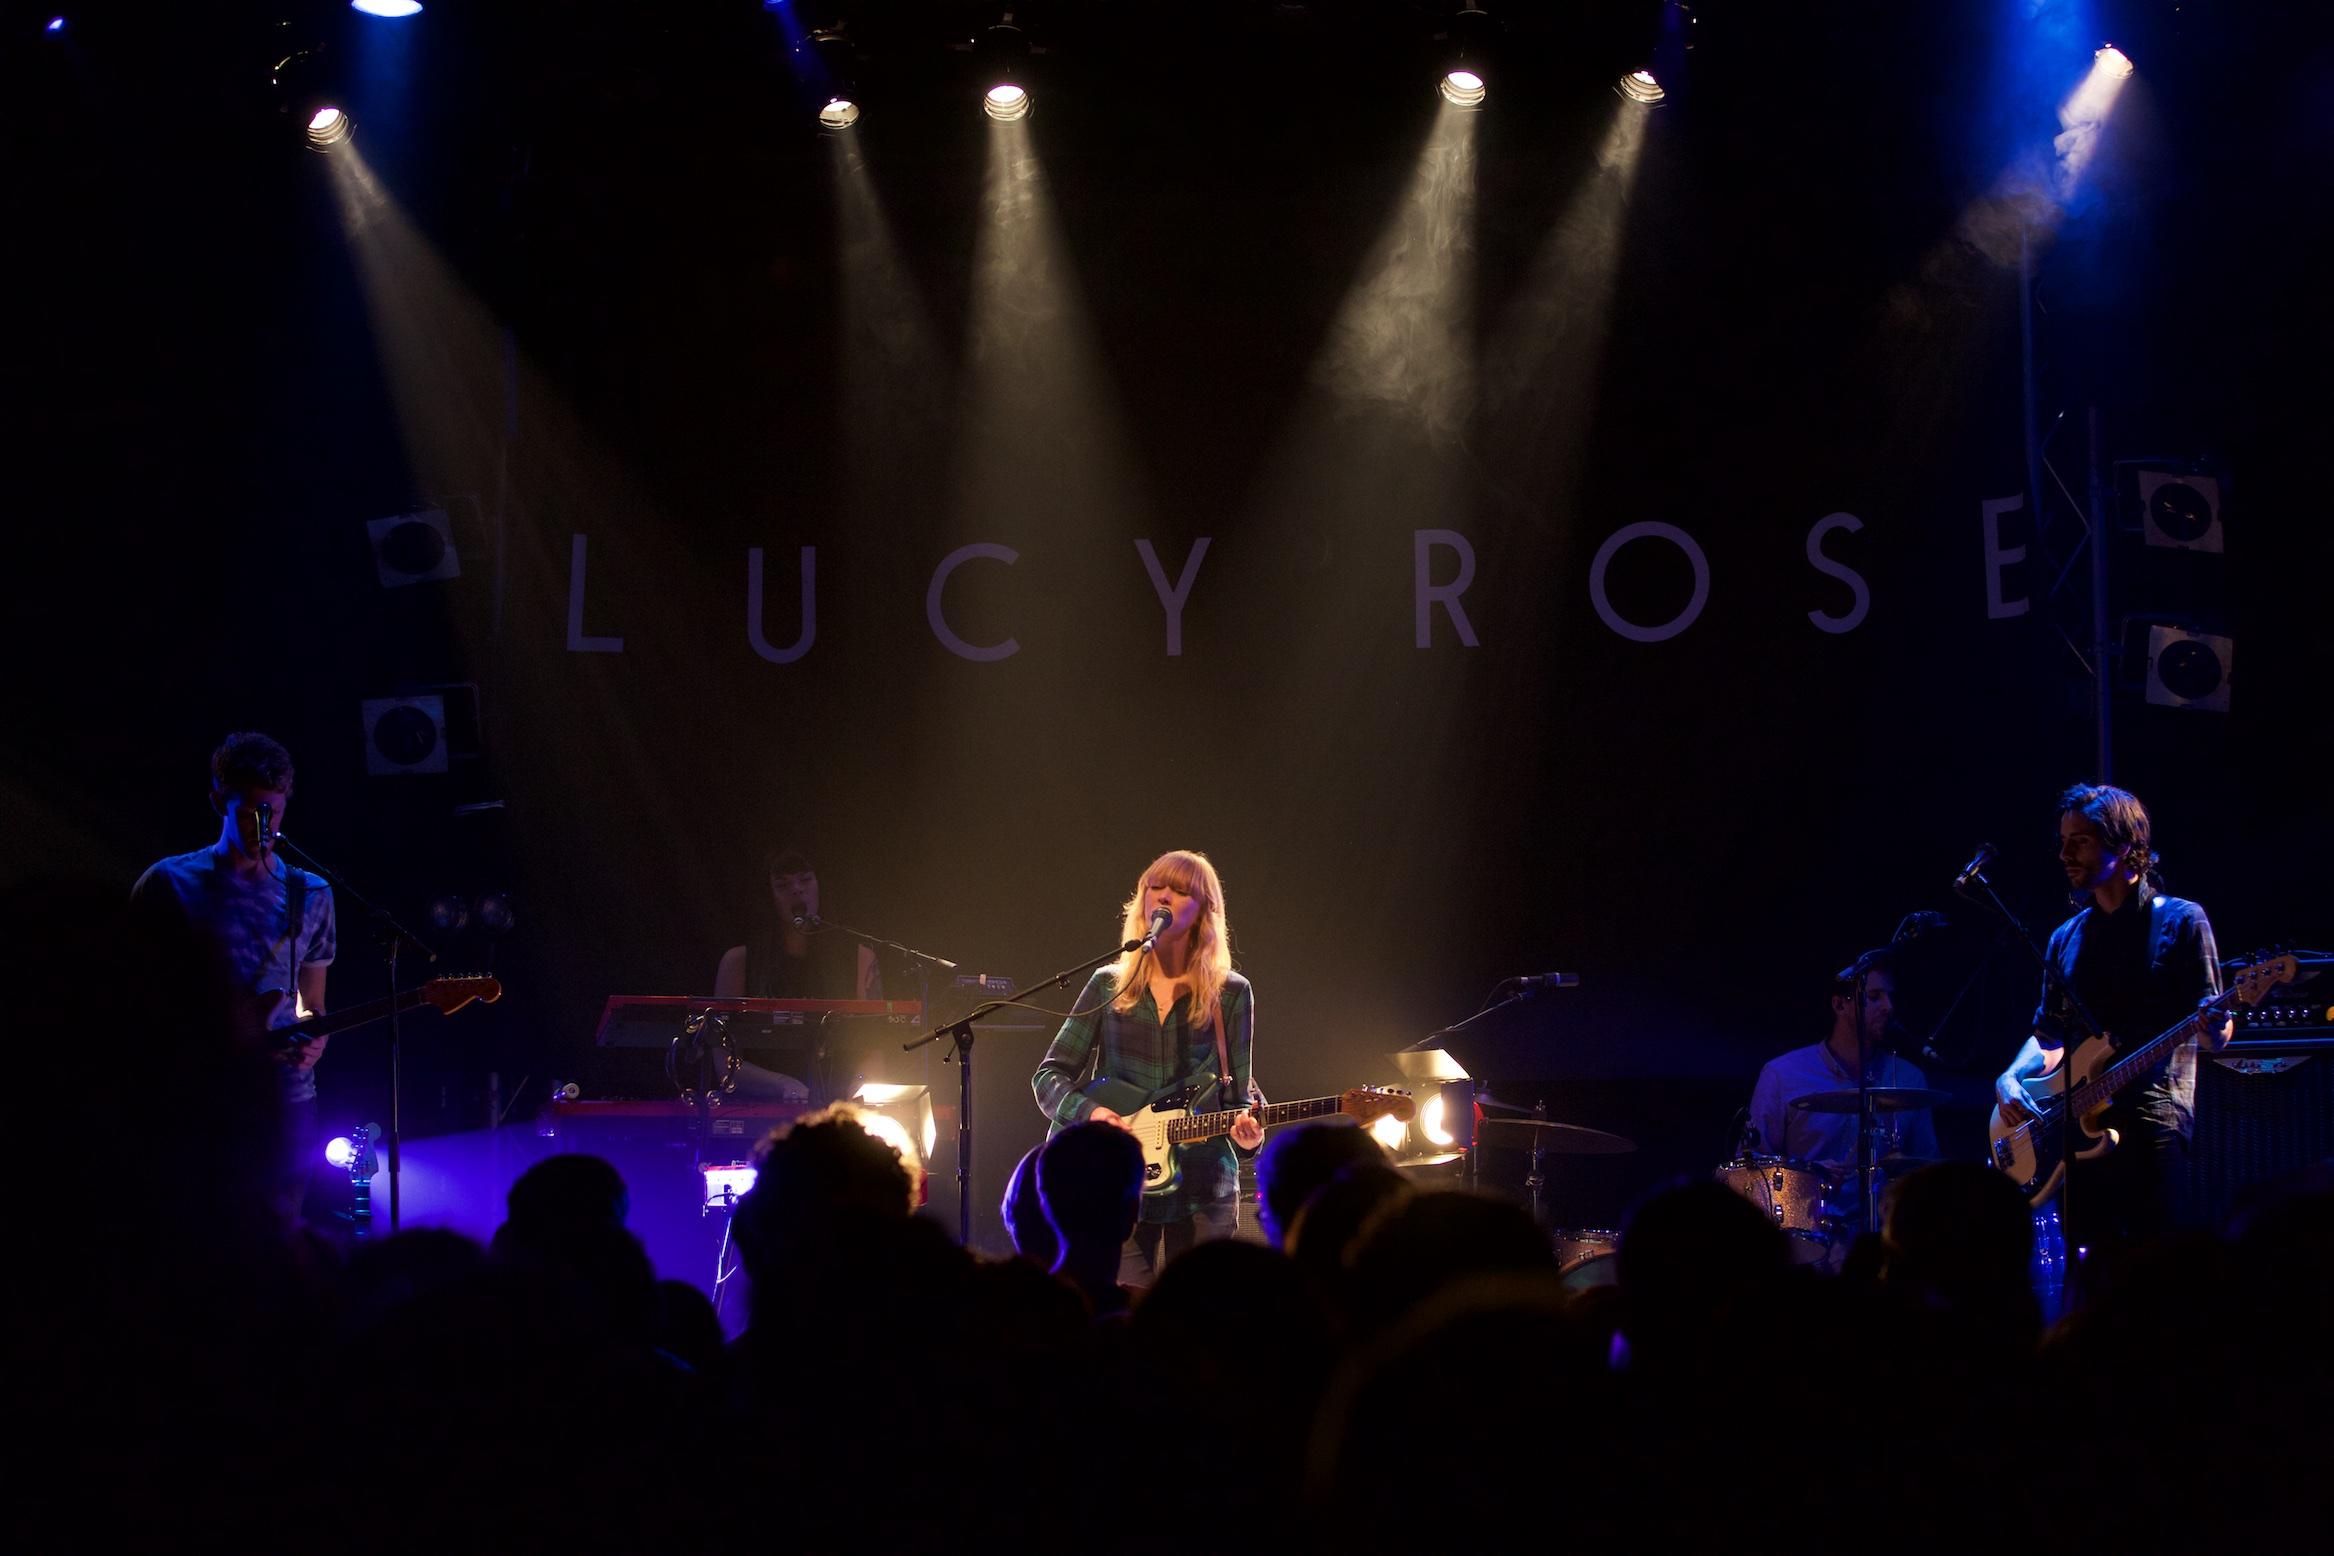 Lucy Rose © Marc Aitken 2015. www.marcaitken.com16.jpg